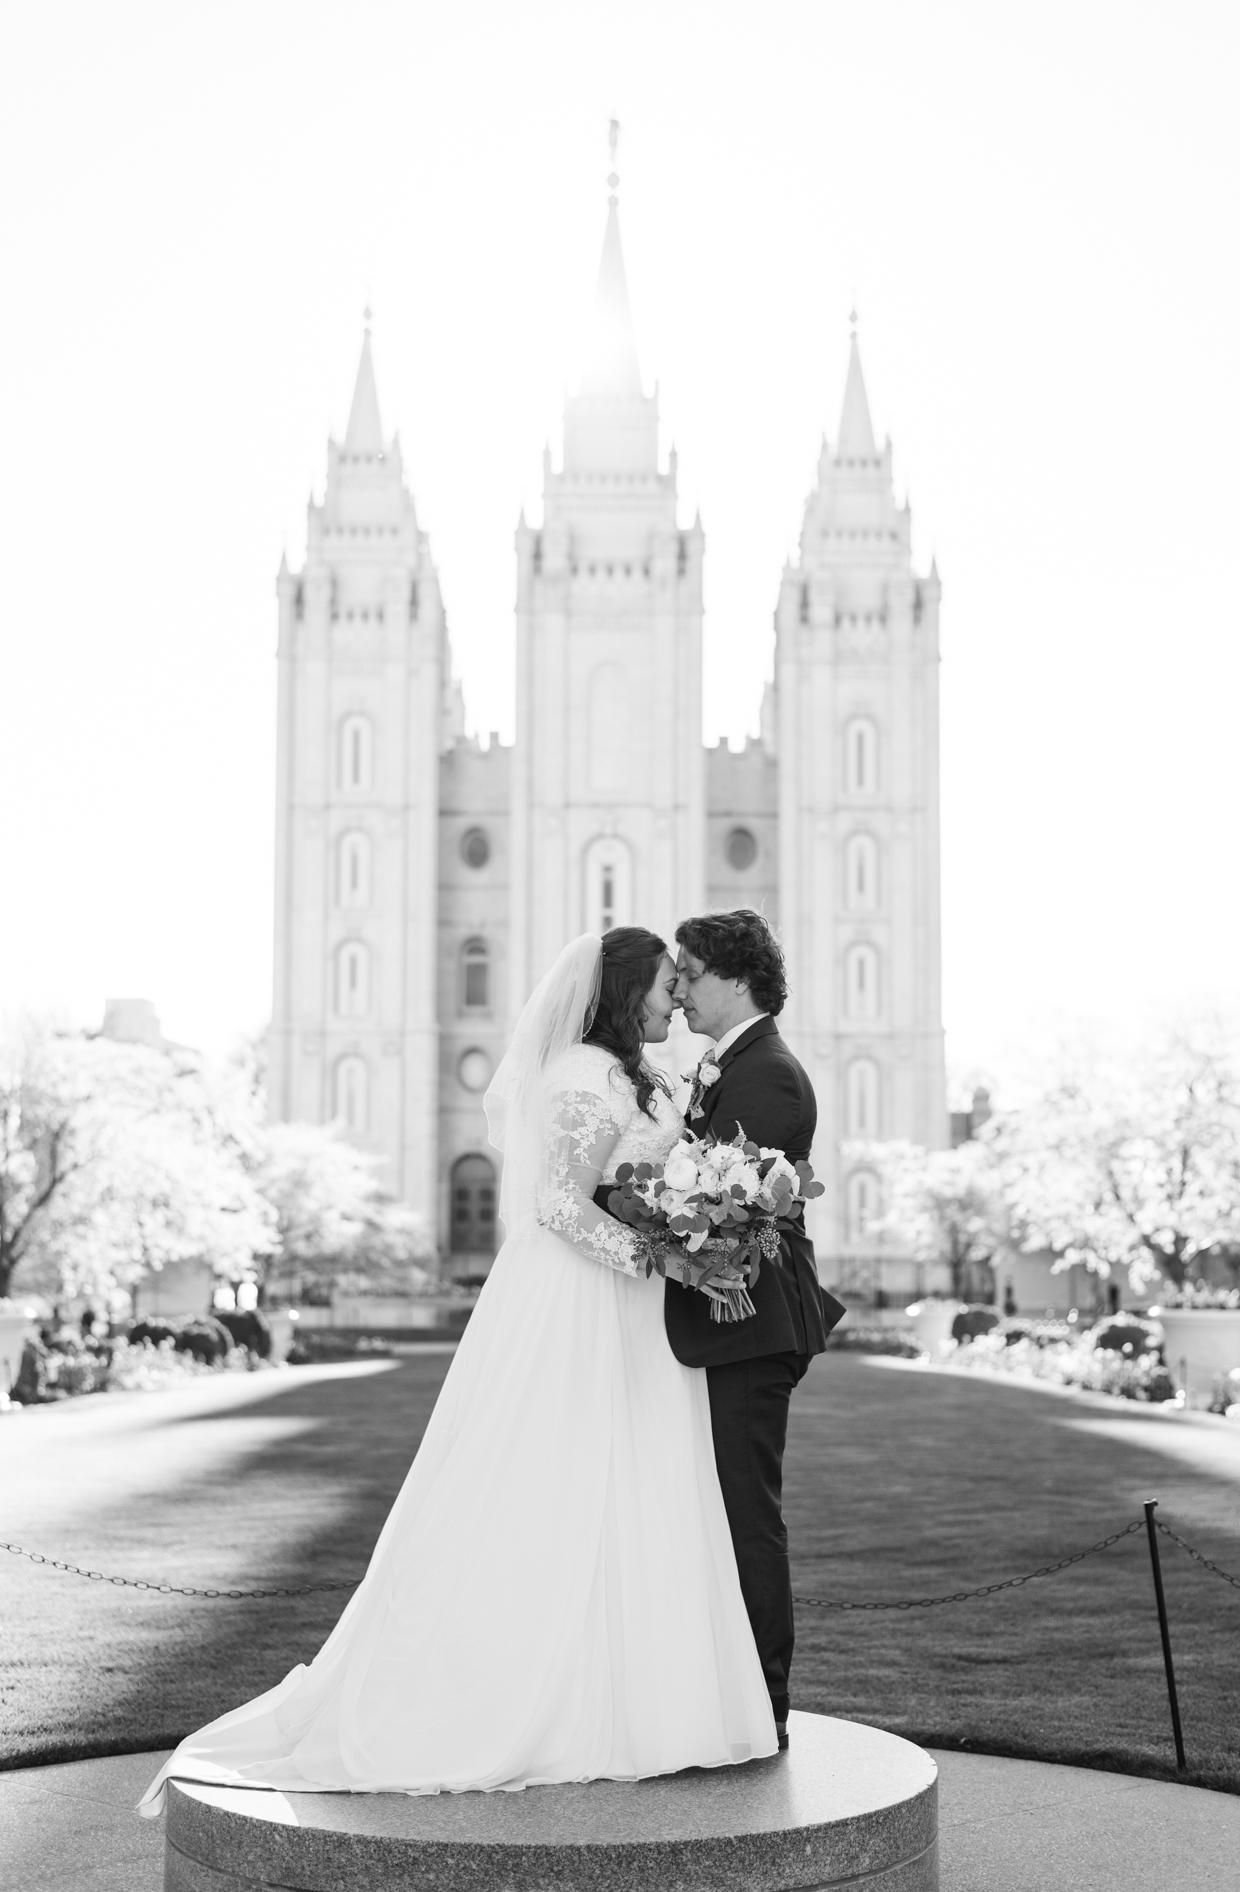 bailey.dayel bridals-19.jpg